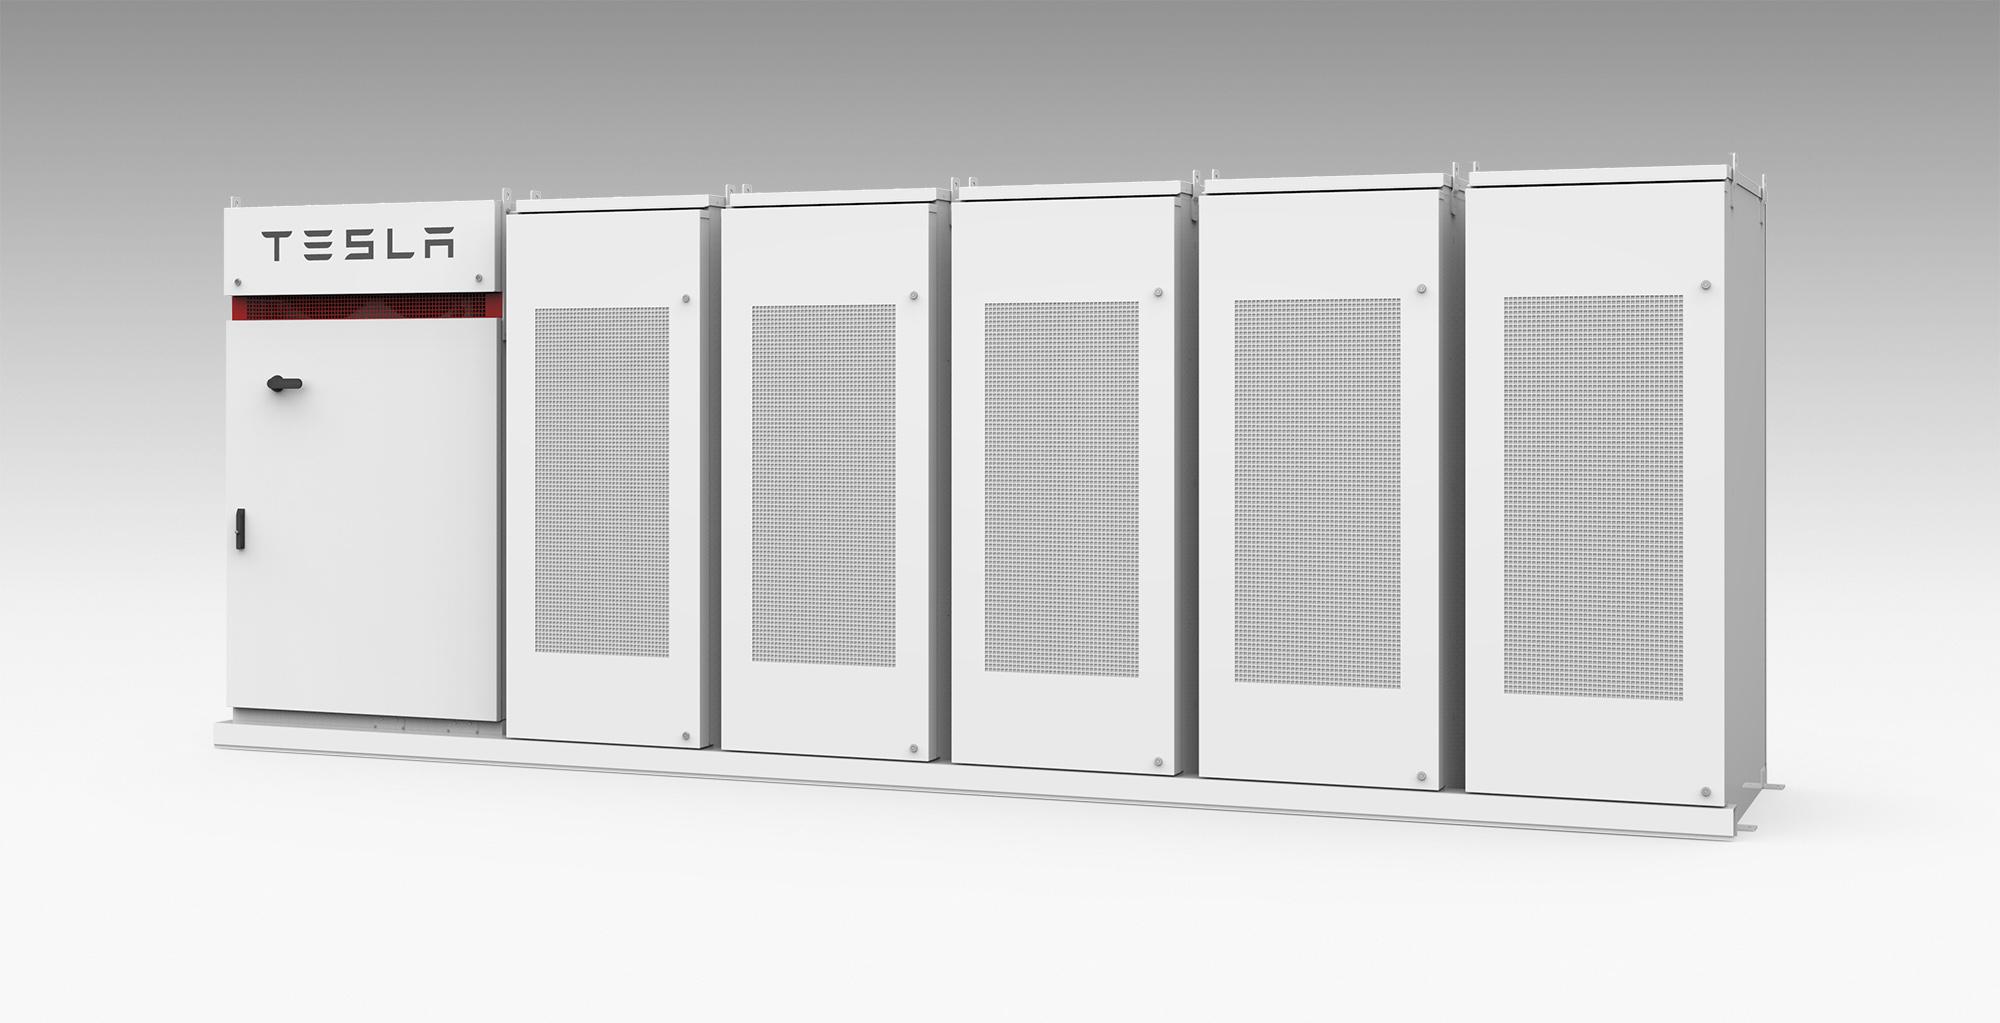 A Tesla Powerback commercial electricity storage unit.